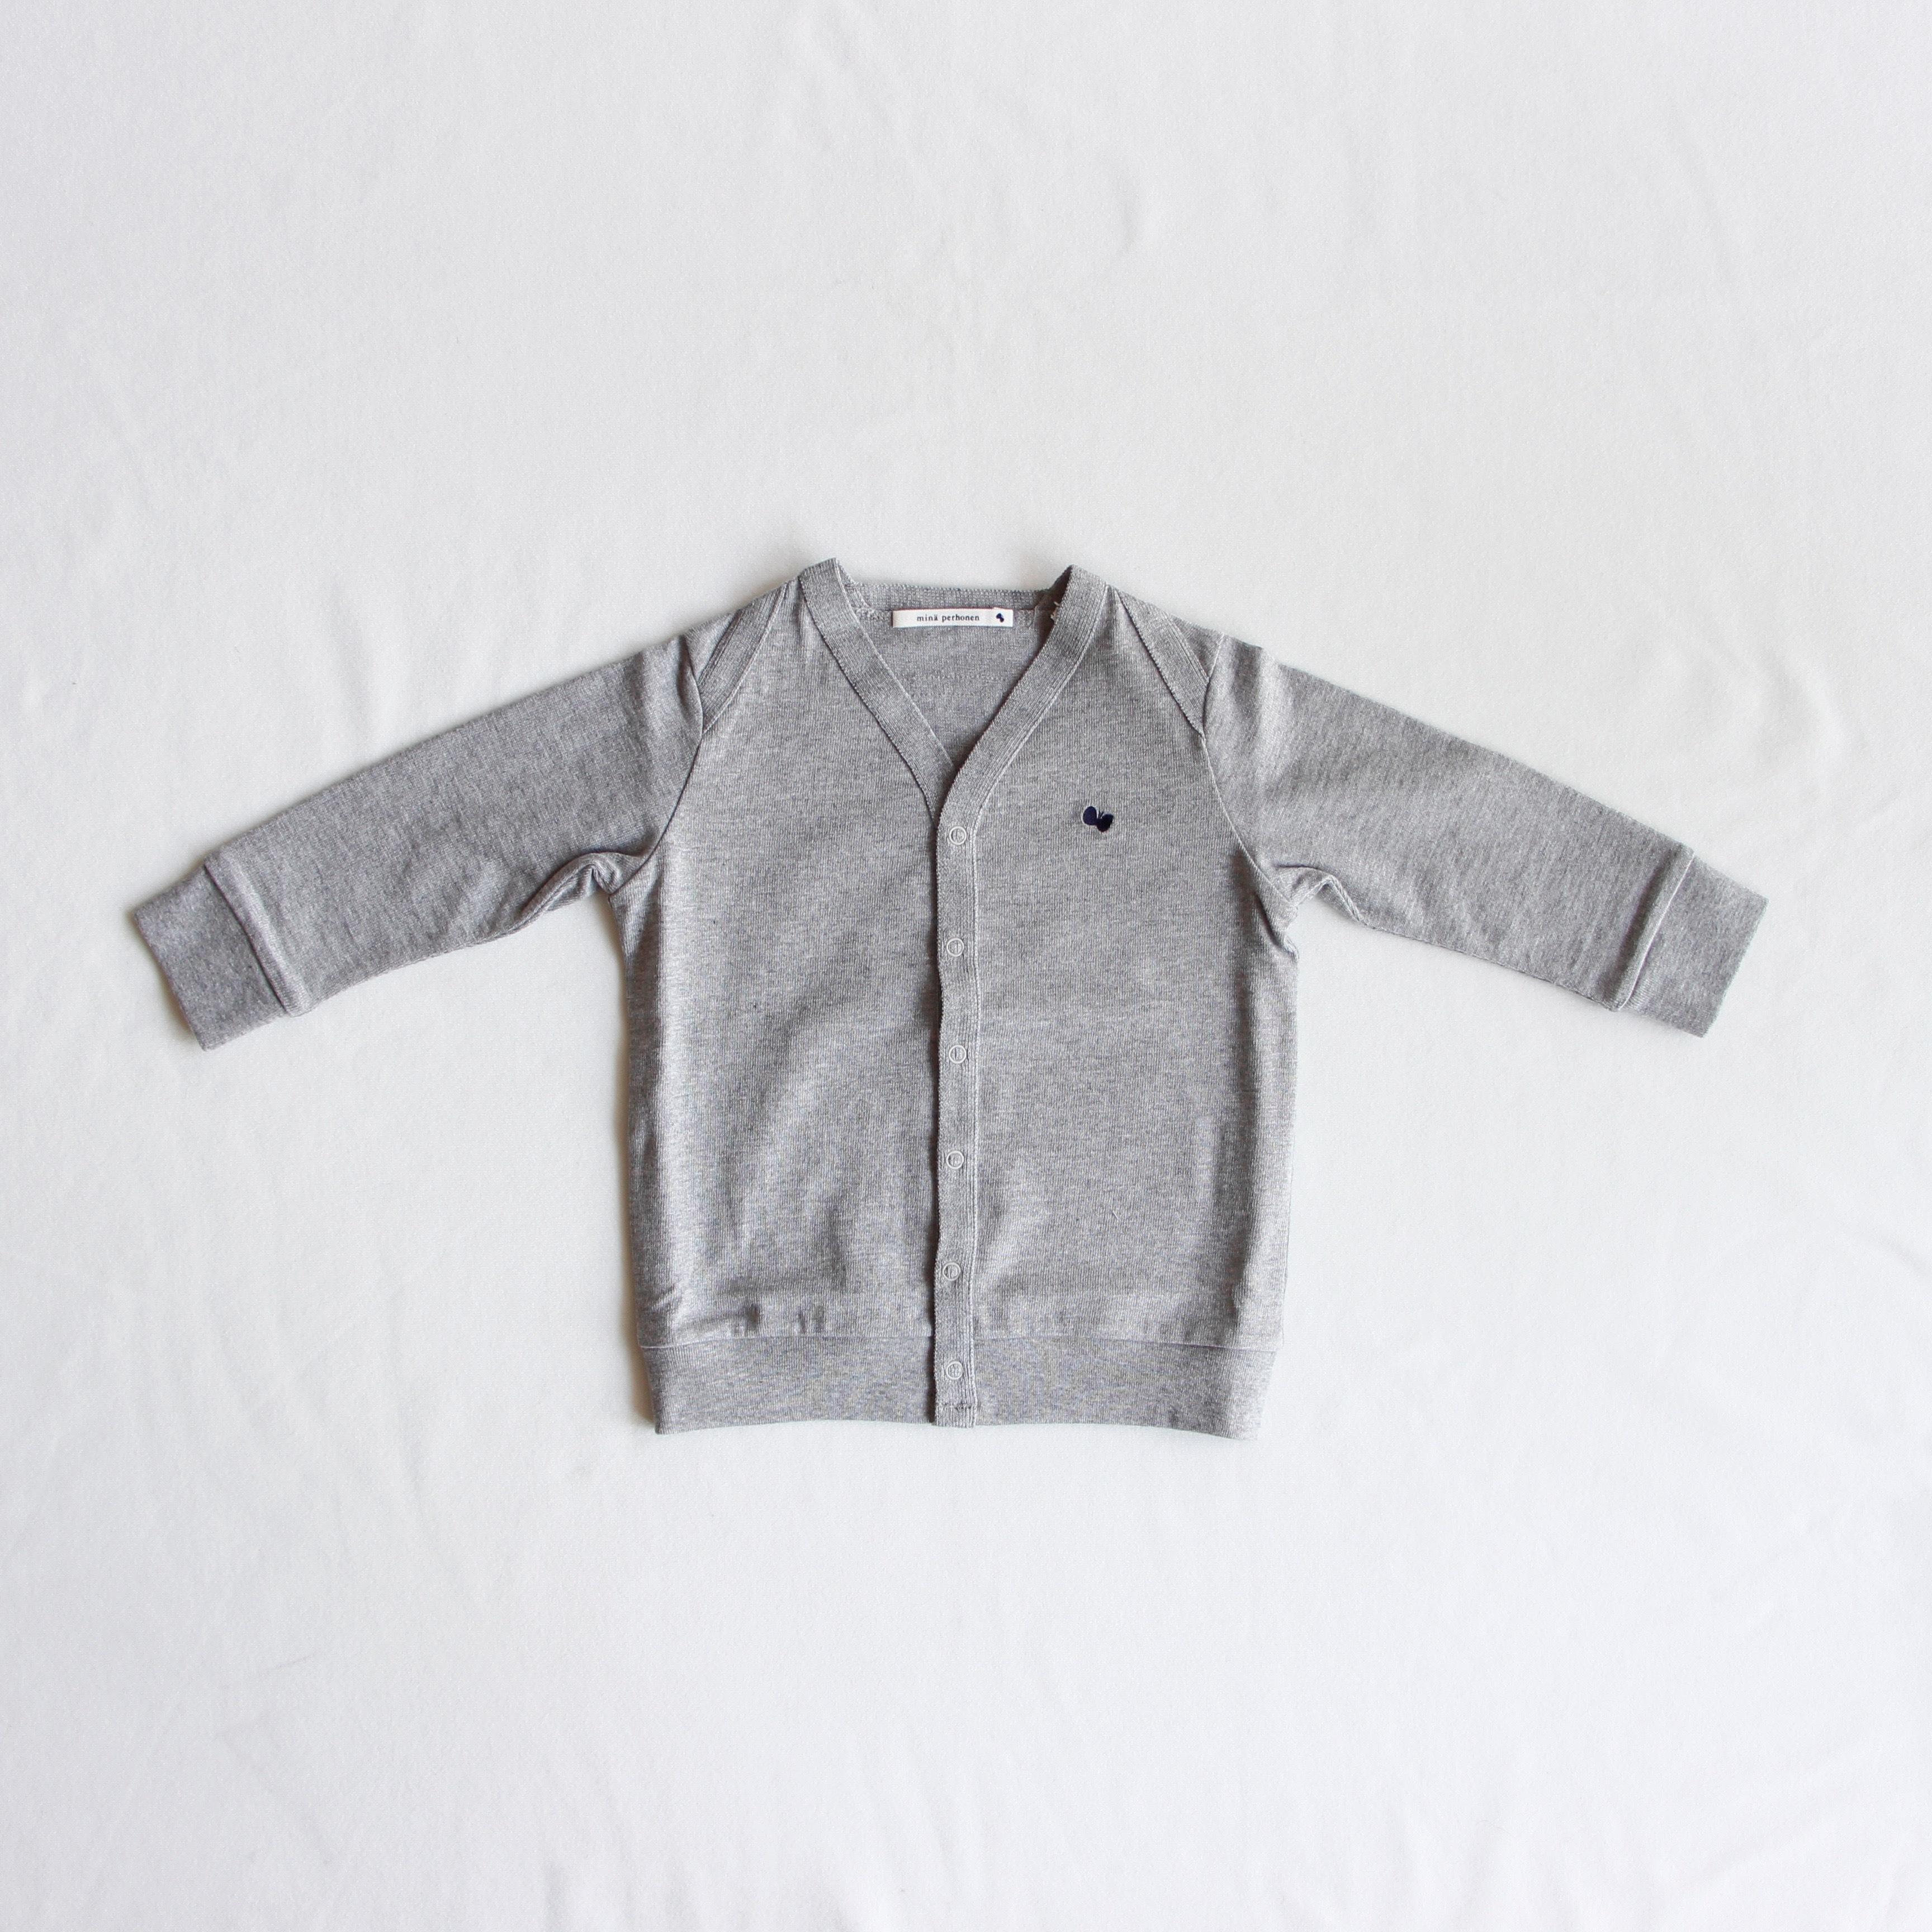 《mina perhonen》zutto カーディガン / gray / 110-130cm